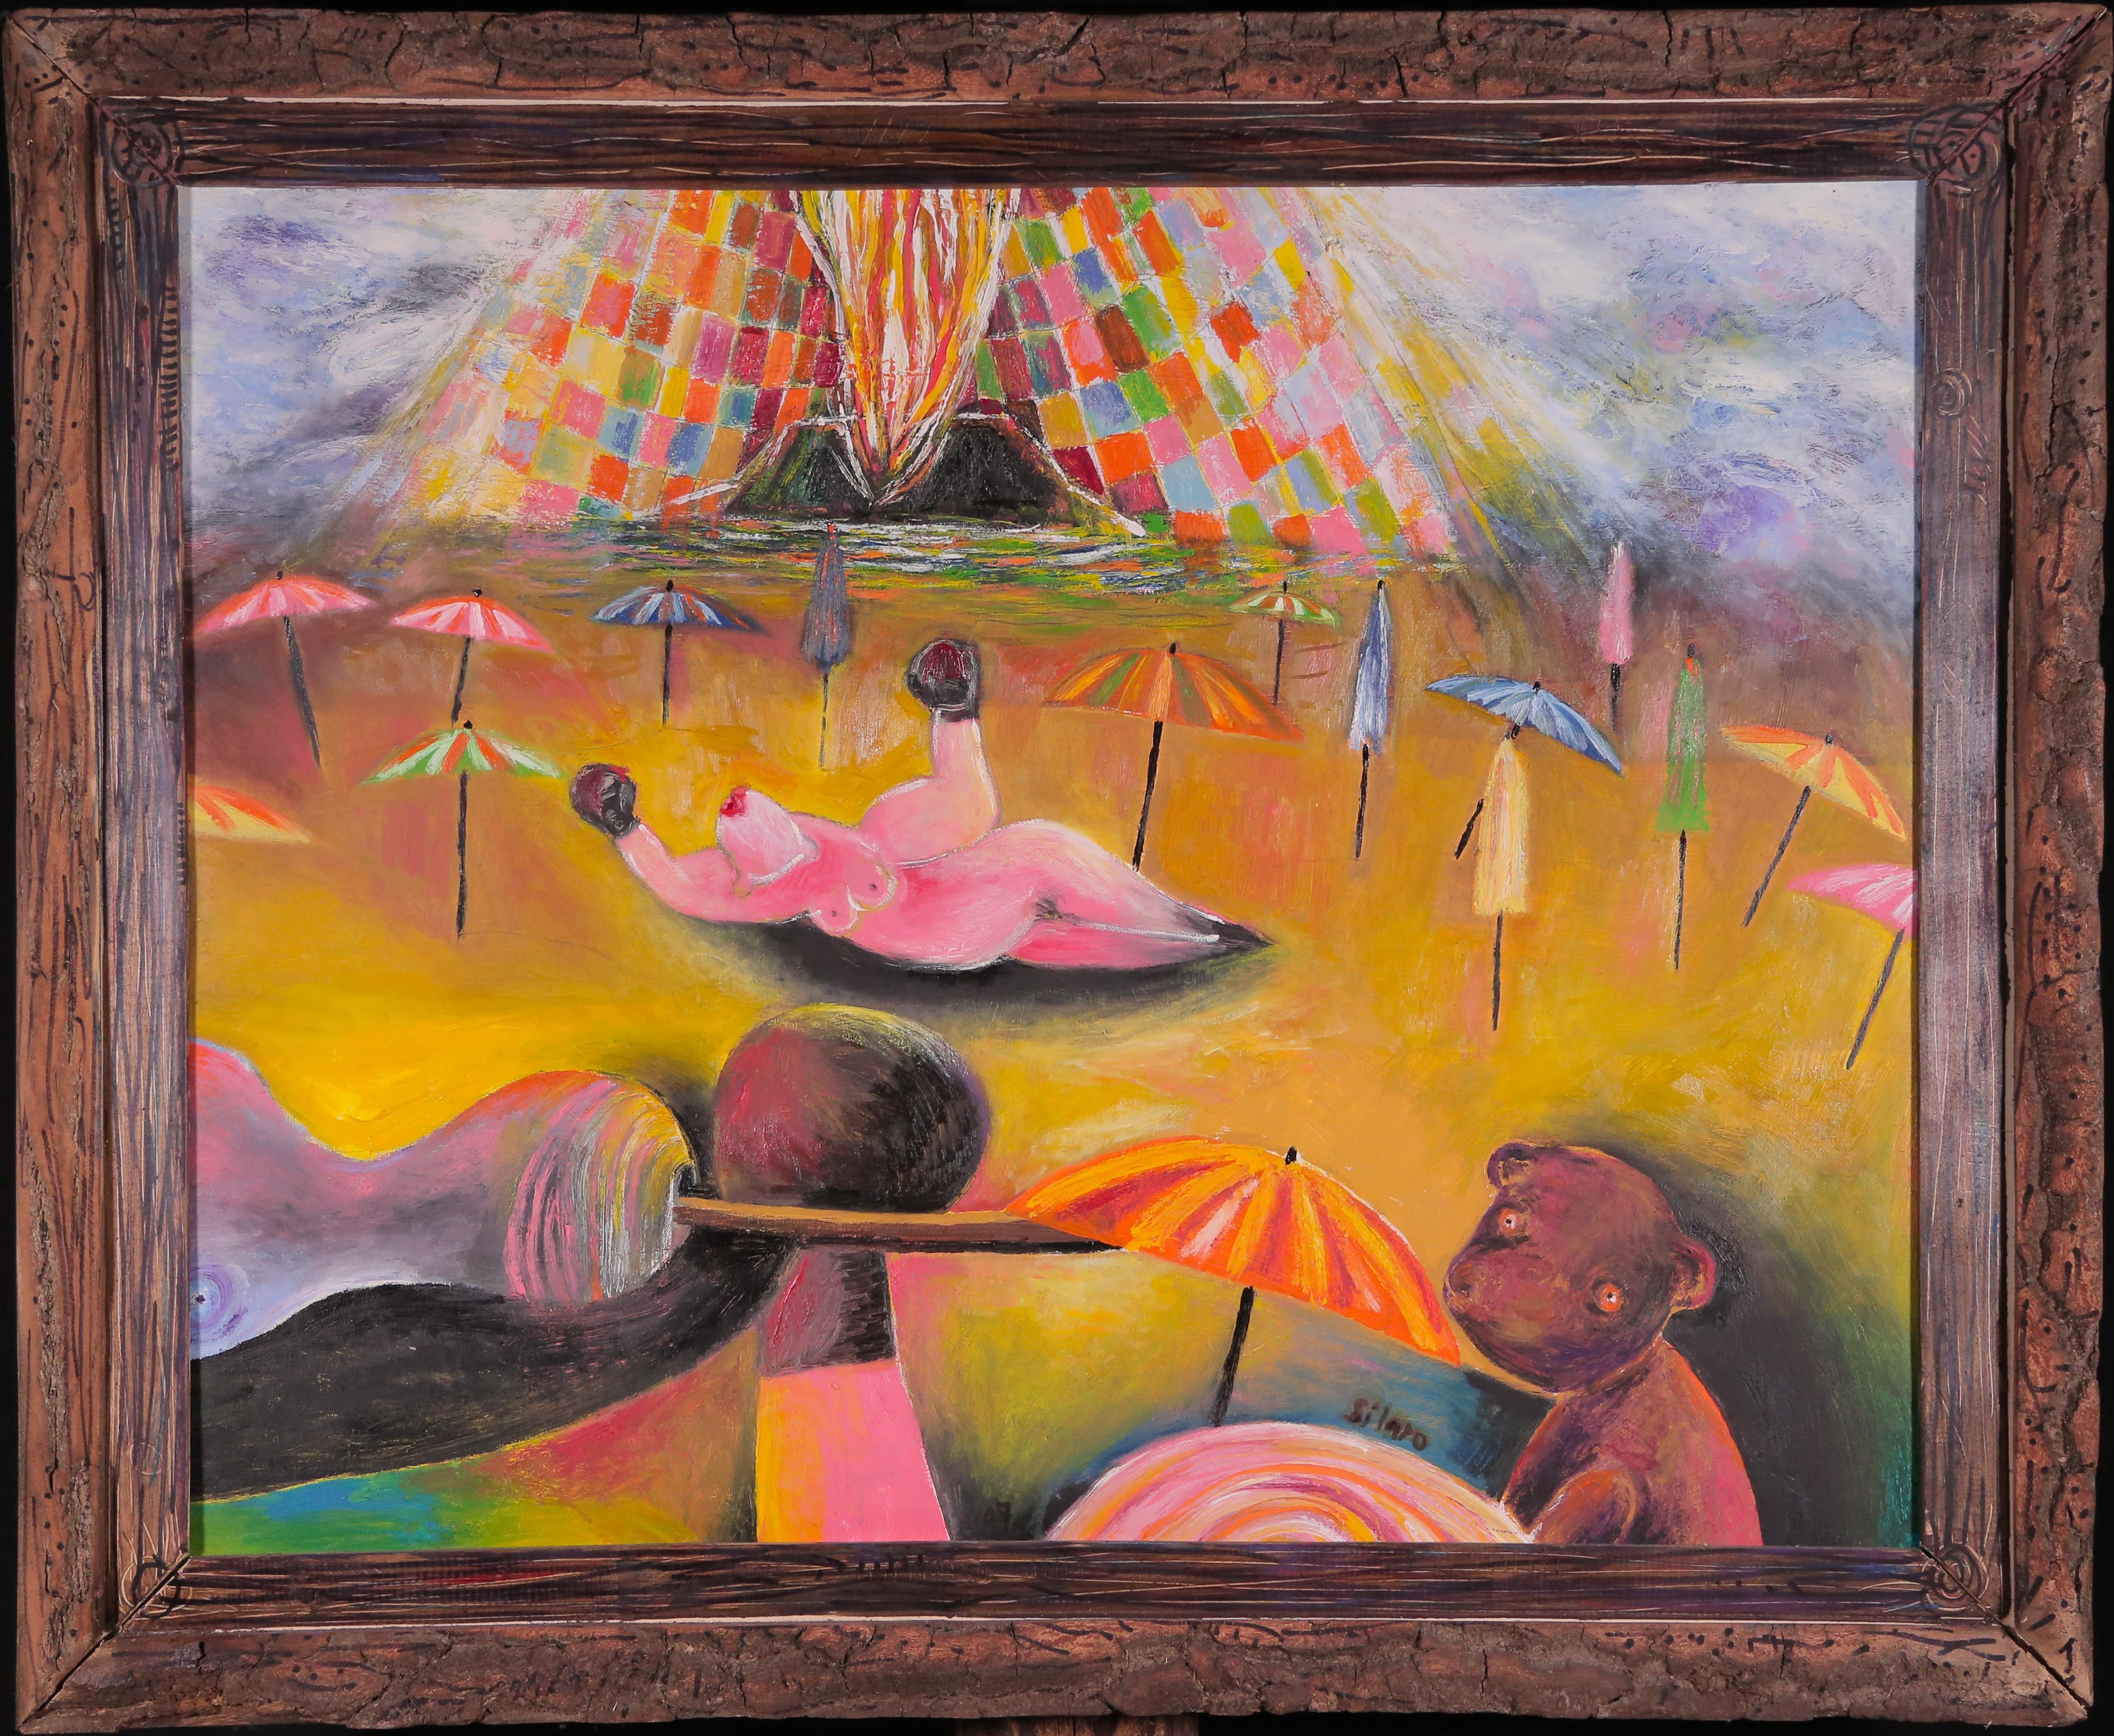 Post-season with Eruption, Szilard Szilagyi, Abstract Oil Painting, Surrealist